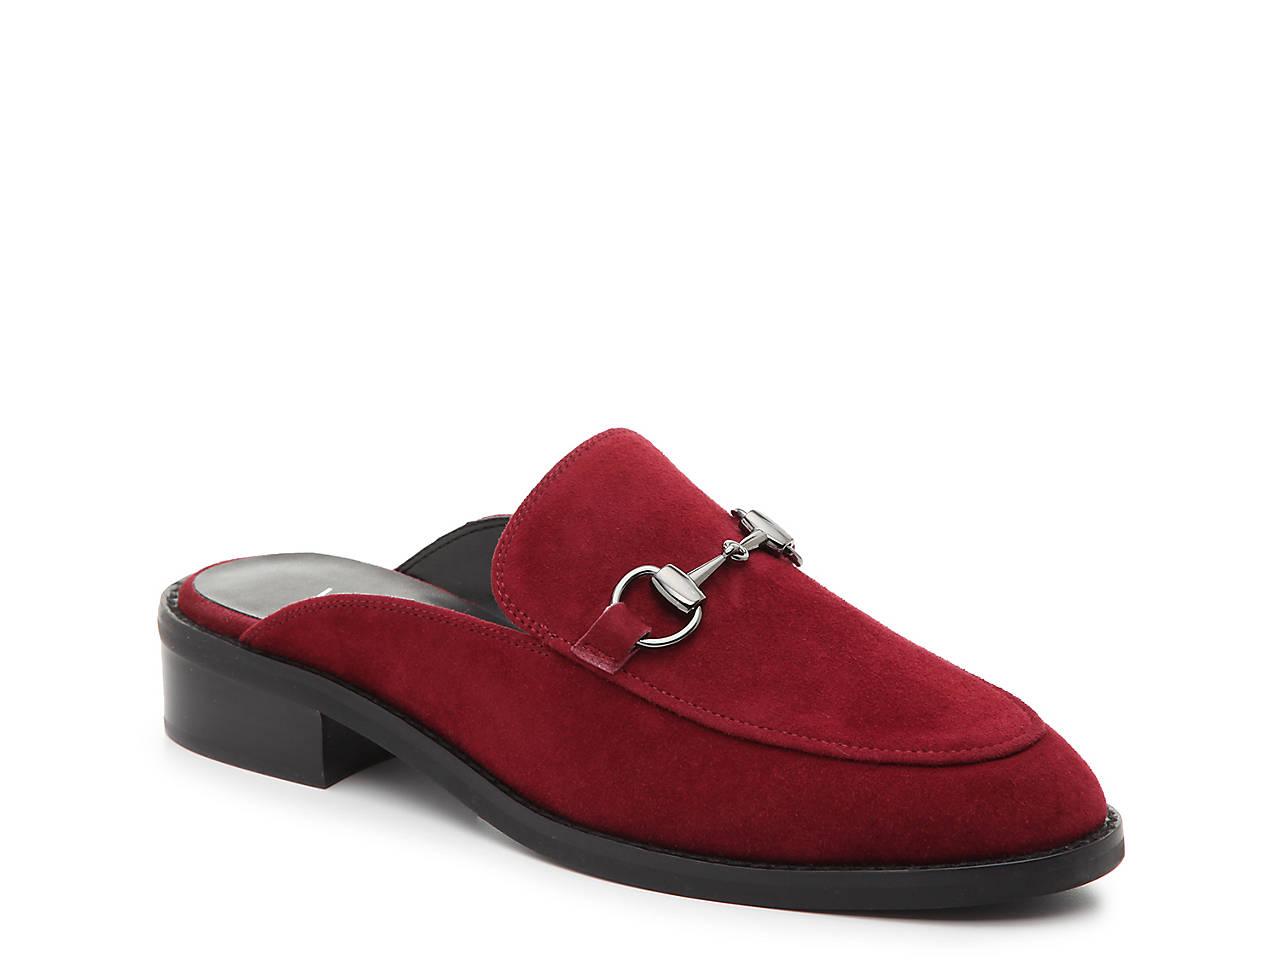 0be59d7e2ad3 VANELi Akela Mule Women s Shoes